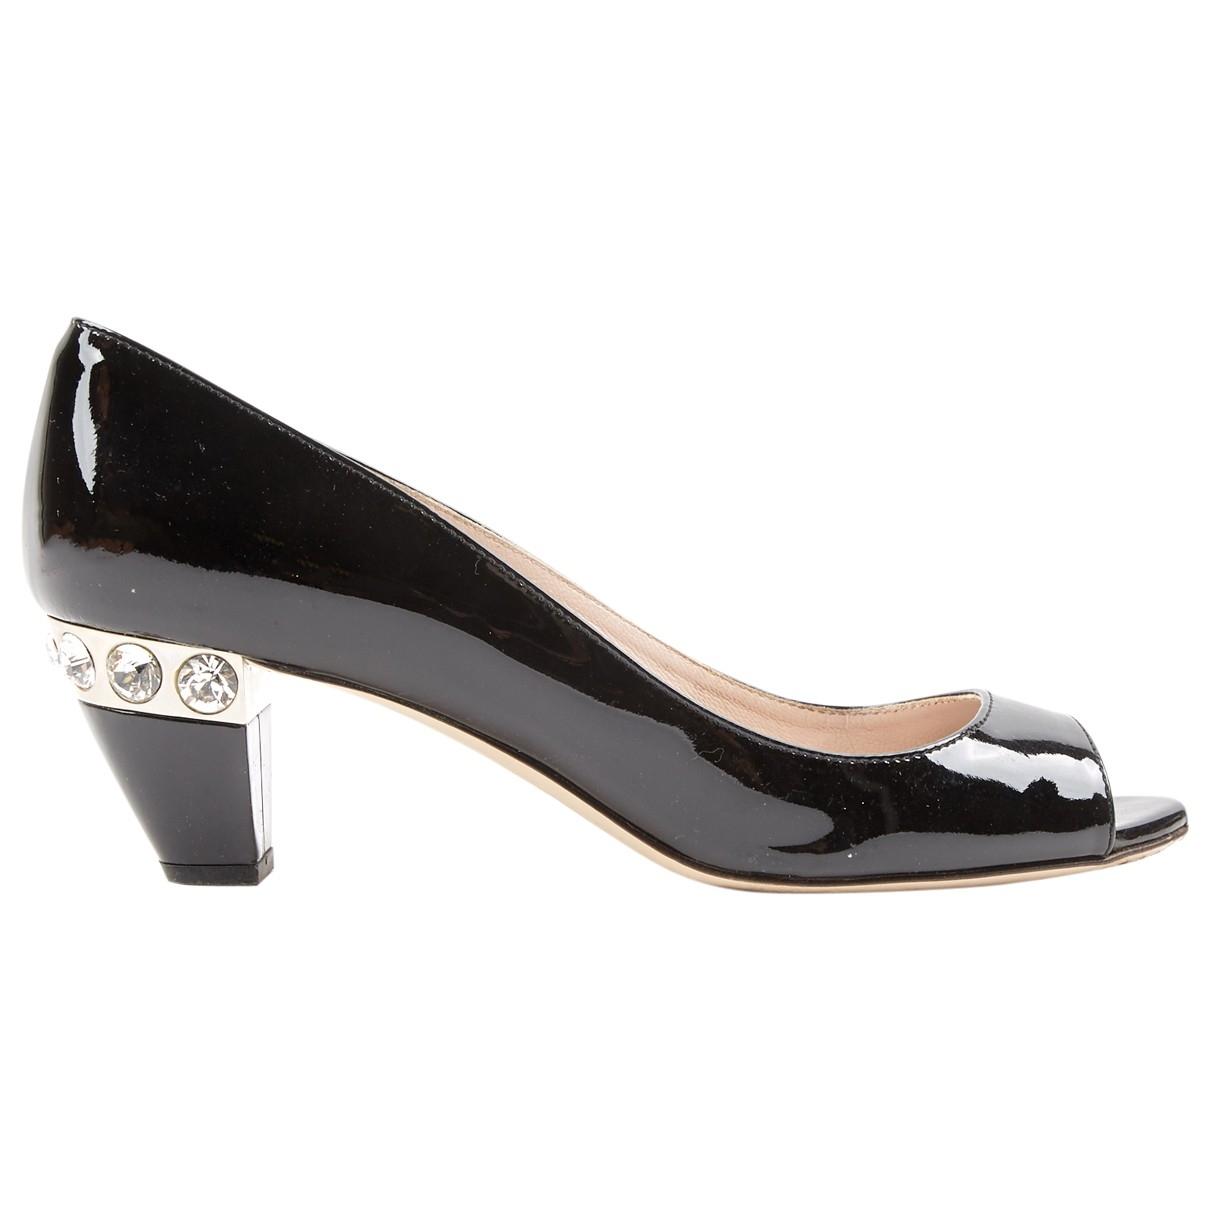 Miu Miu \N Black Patent leather Heels for Women 35.5 EU